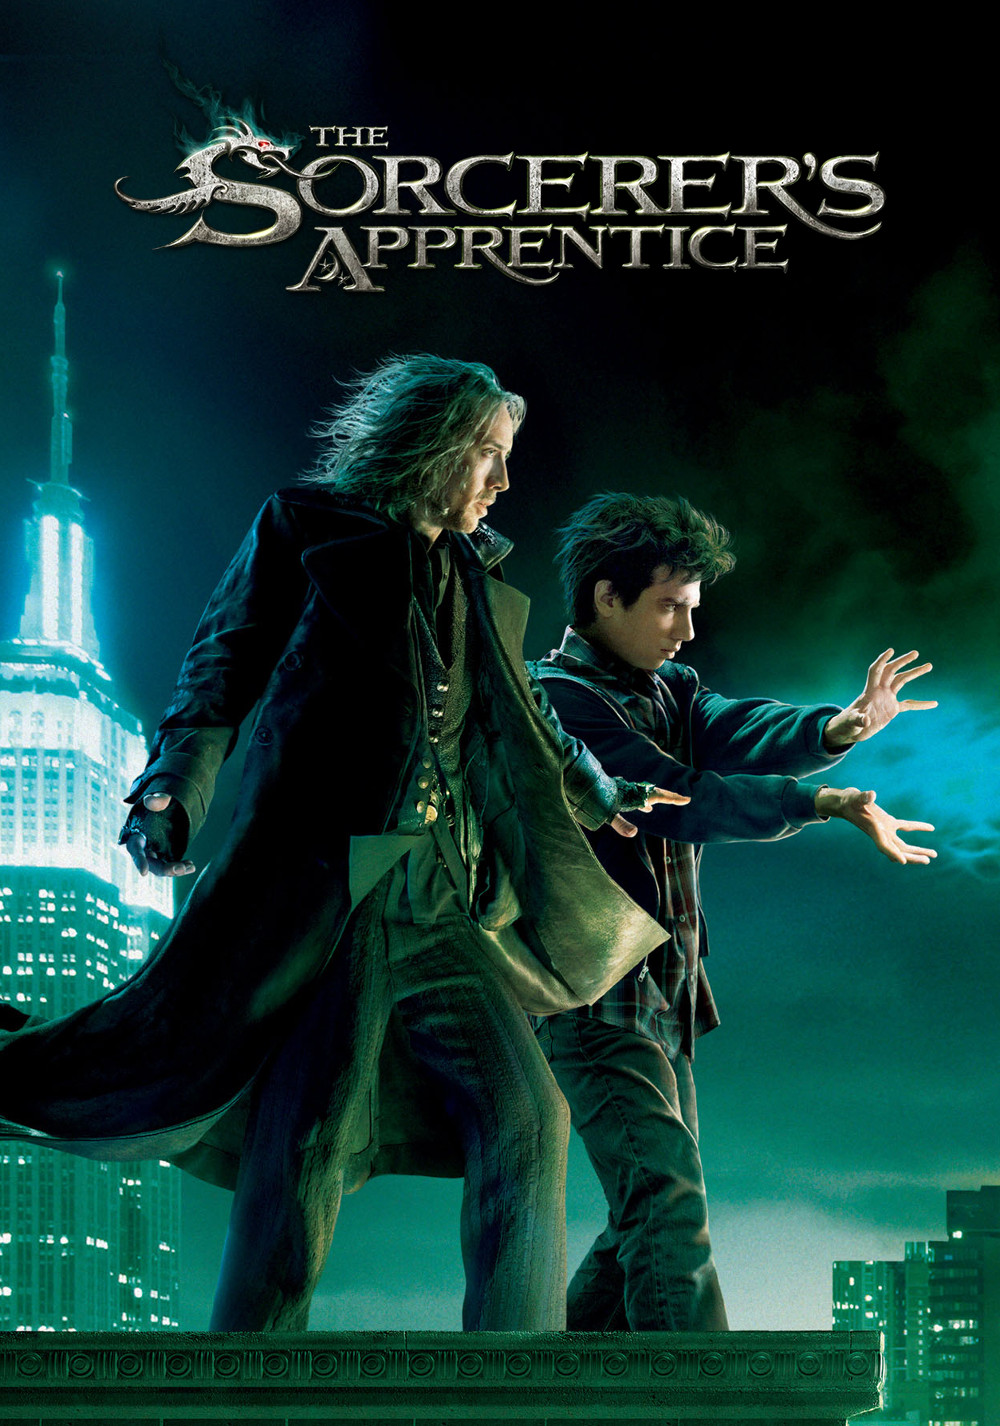 The sorcerers apprentice intro celebrity